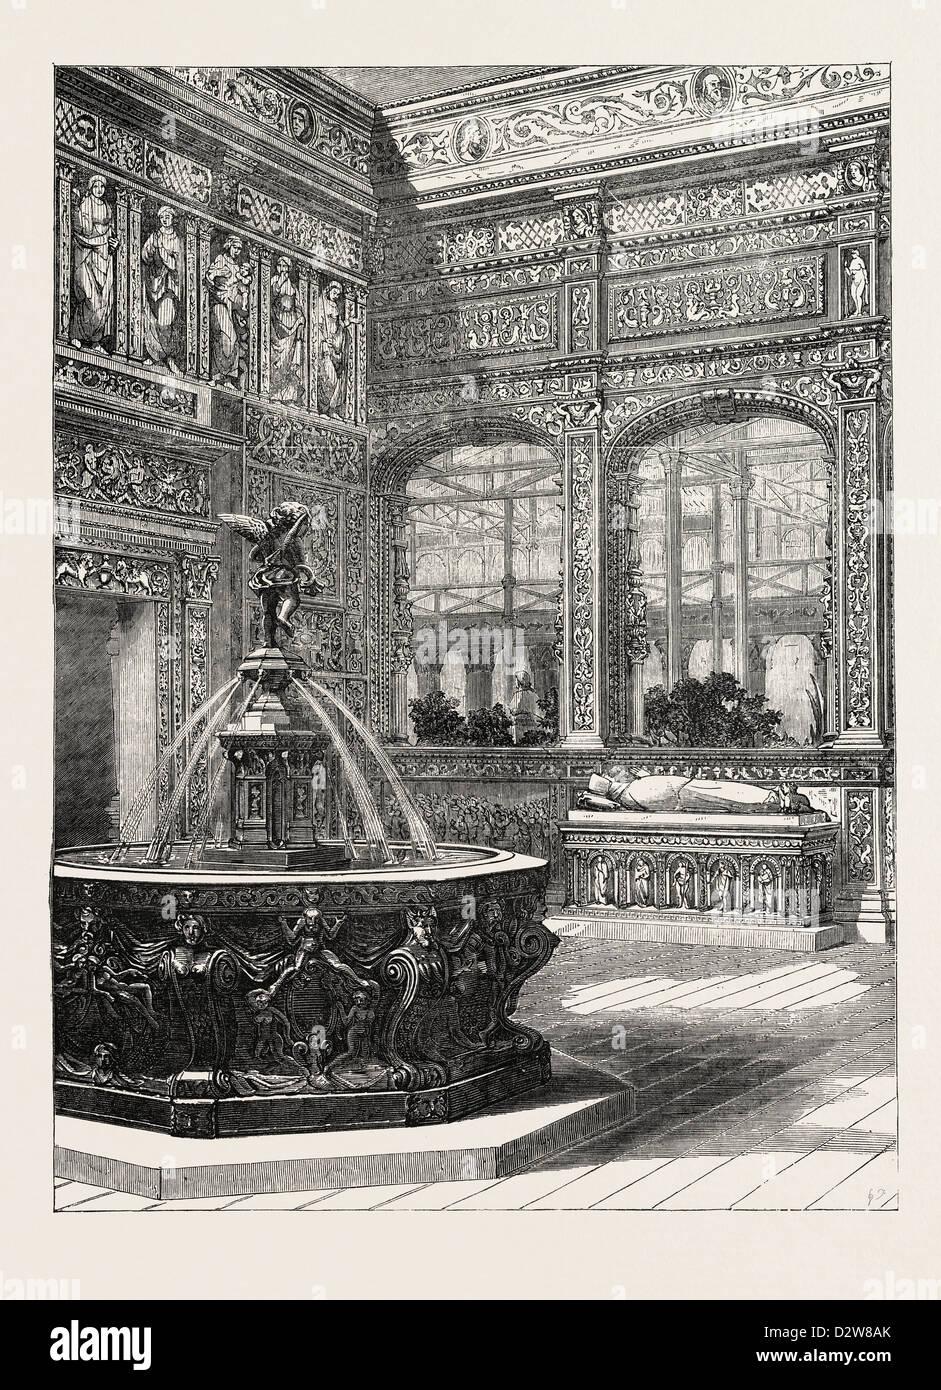 THE RENAISSANCE COURT AT THE CRYSTAL PALACE SYDENHAM UK 1854 - Stock Image